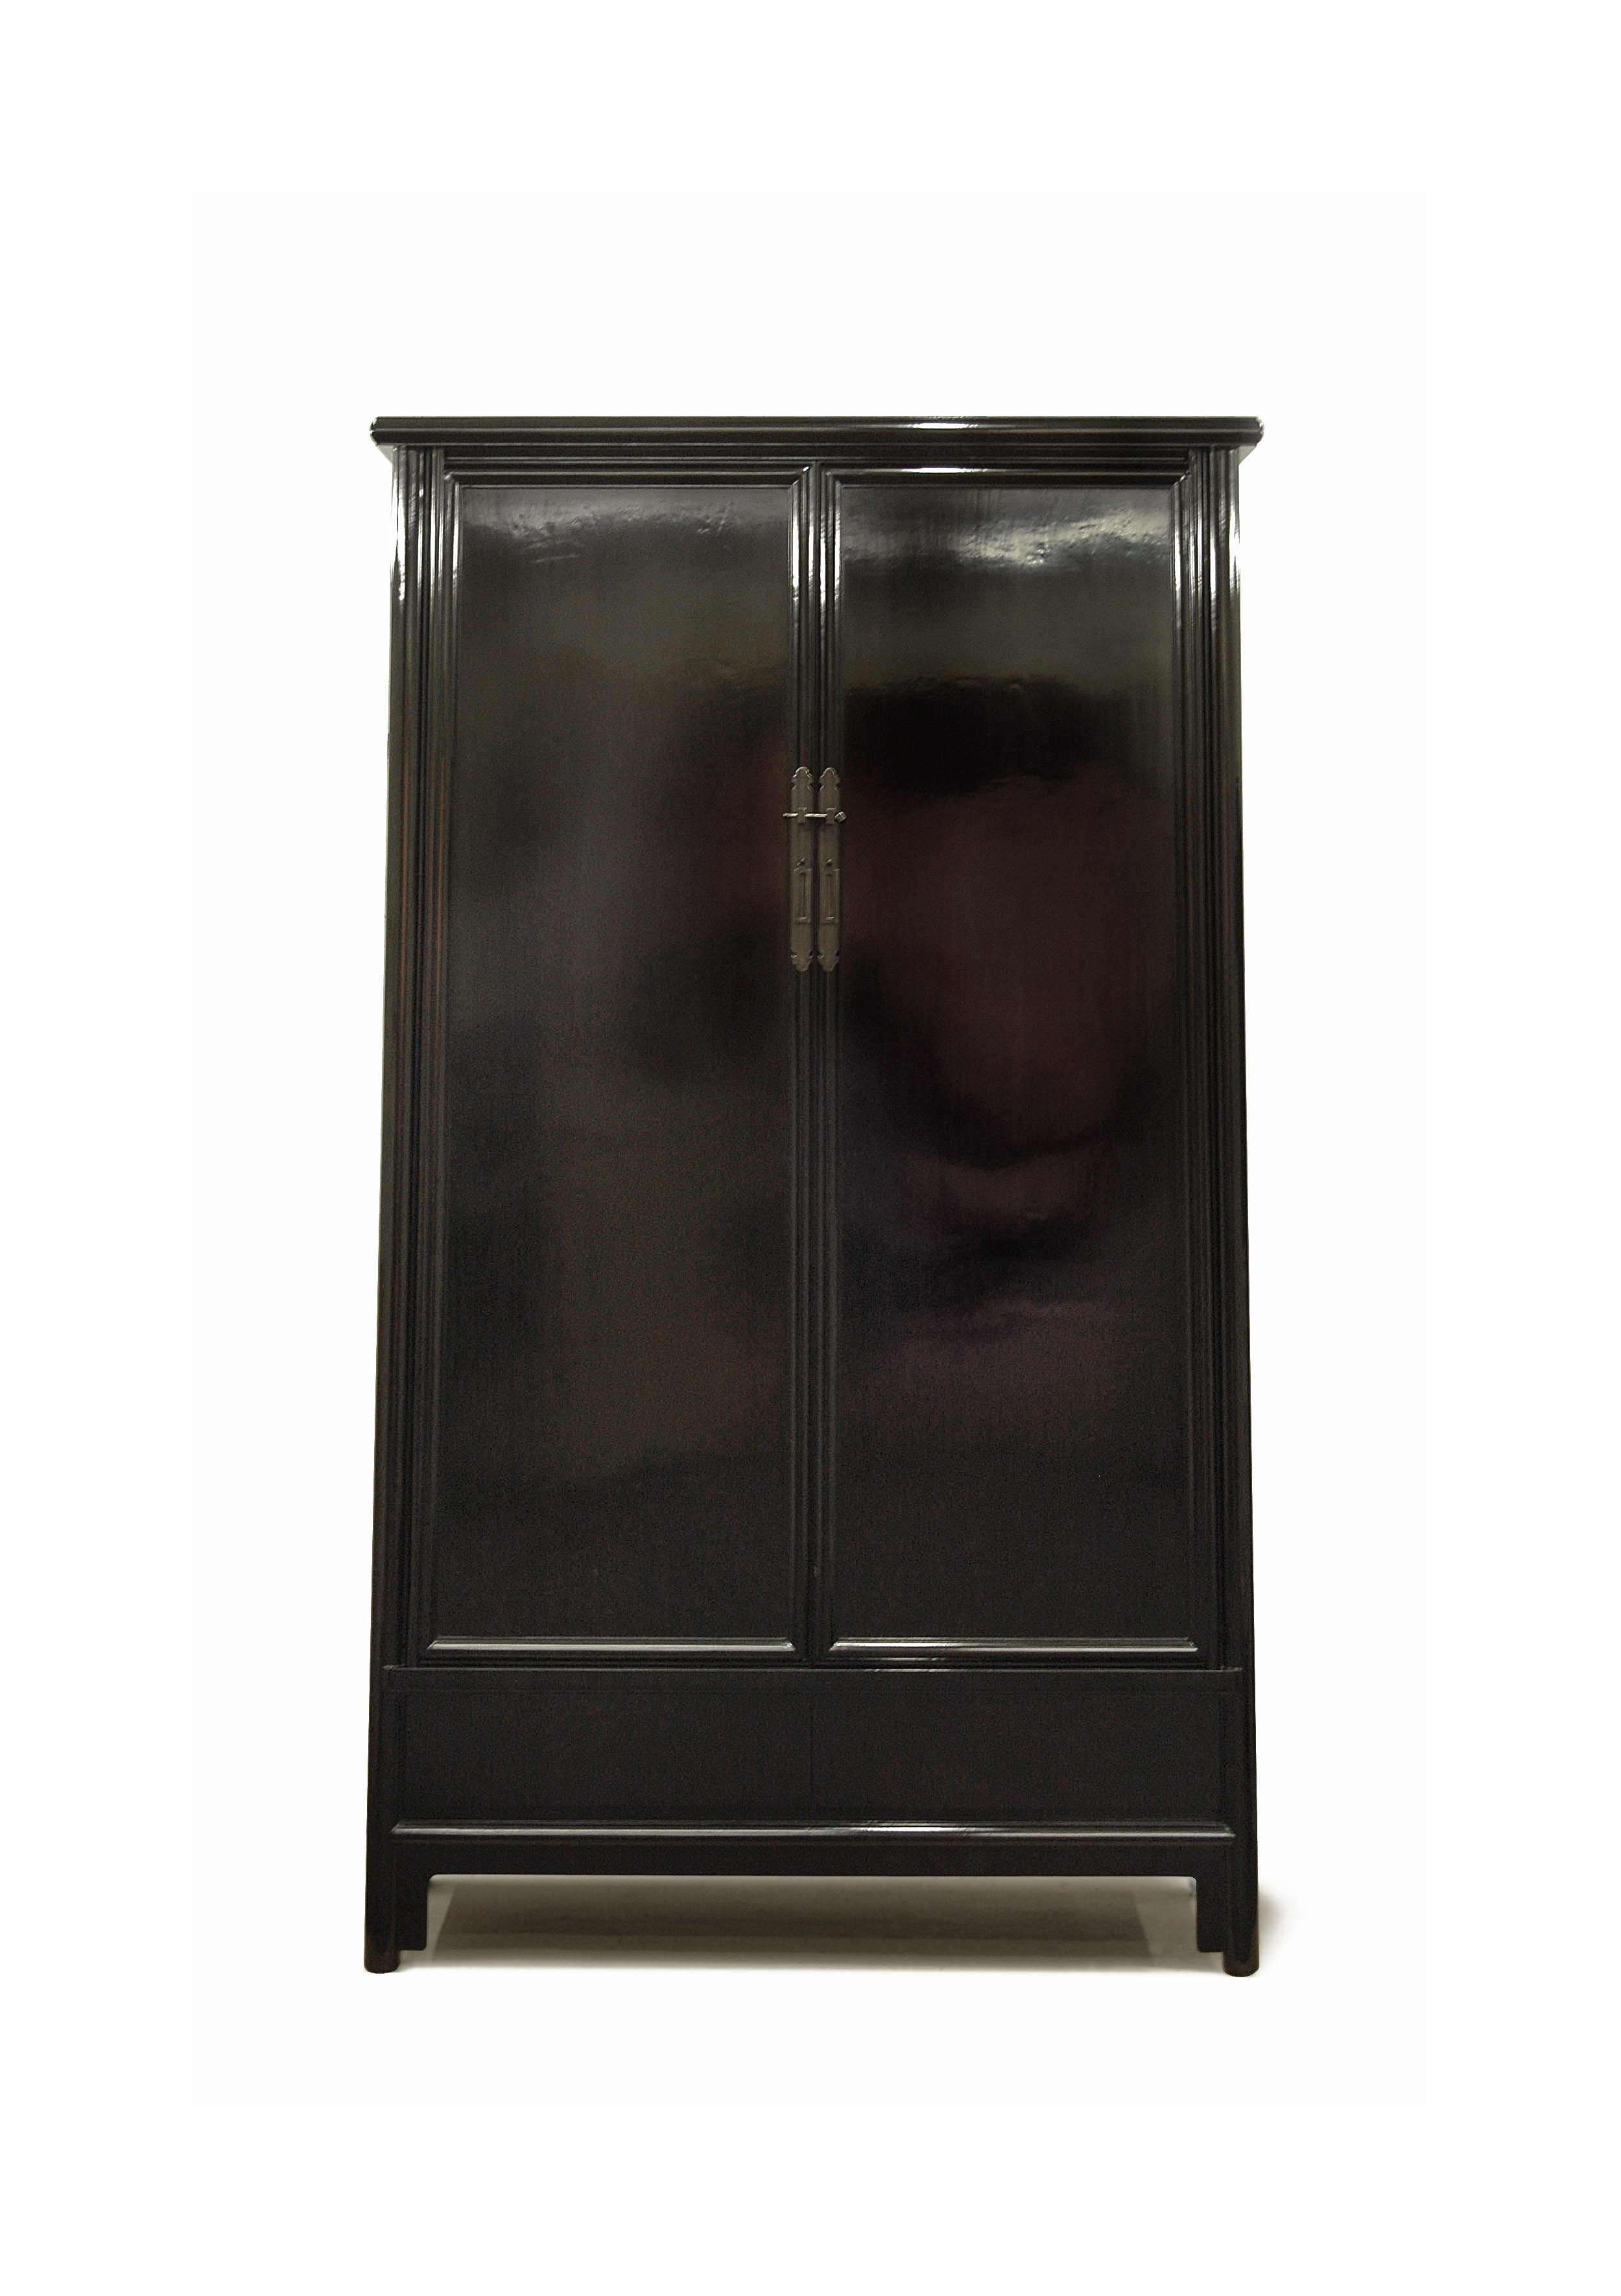 ....bespoke furniture   rosewood london : big armoire..特别定制家具   瑰丽伦敦酒店:大柜....